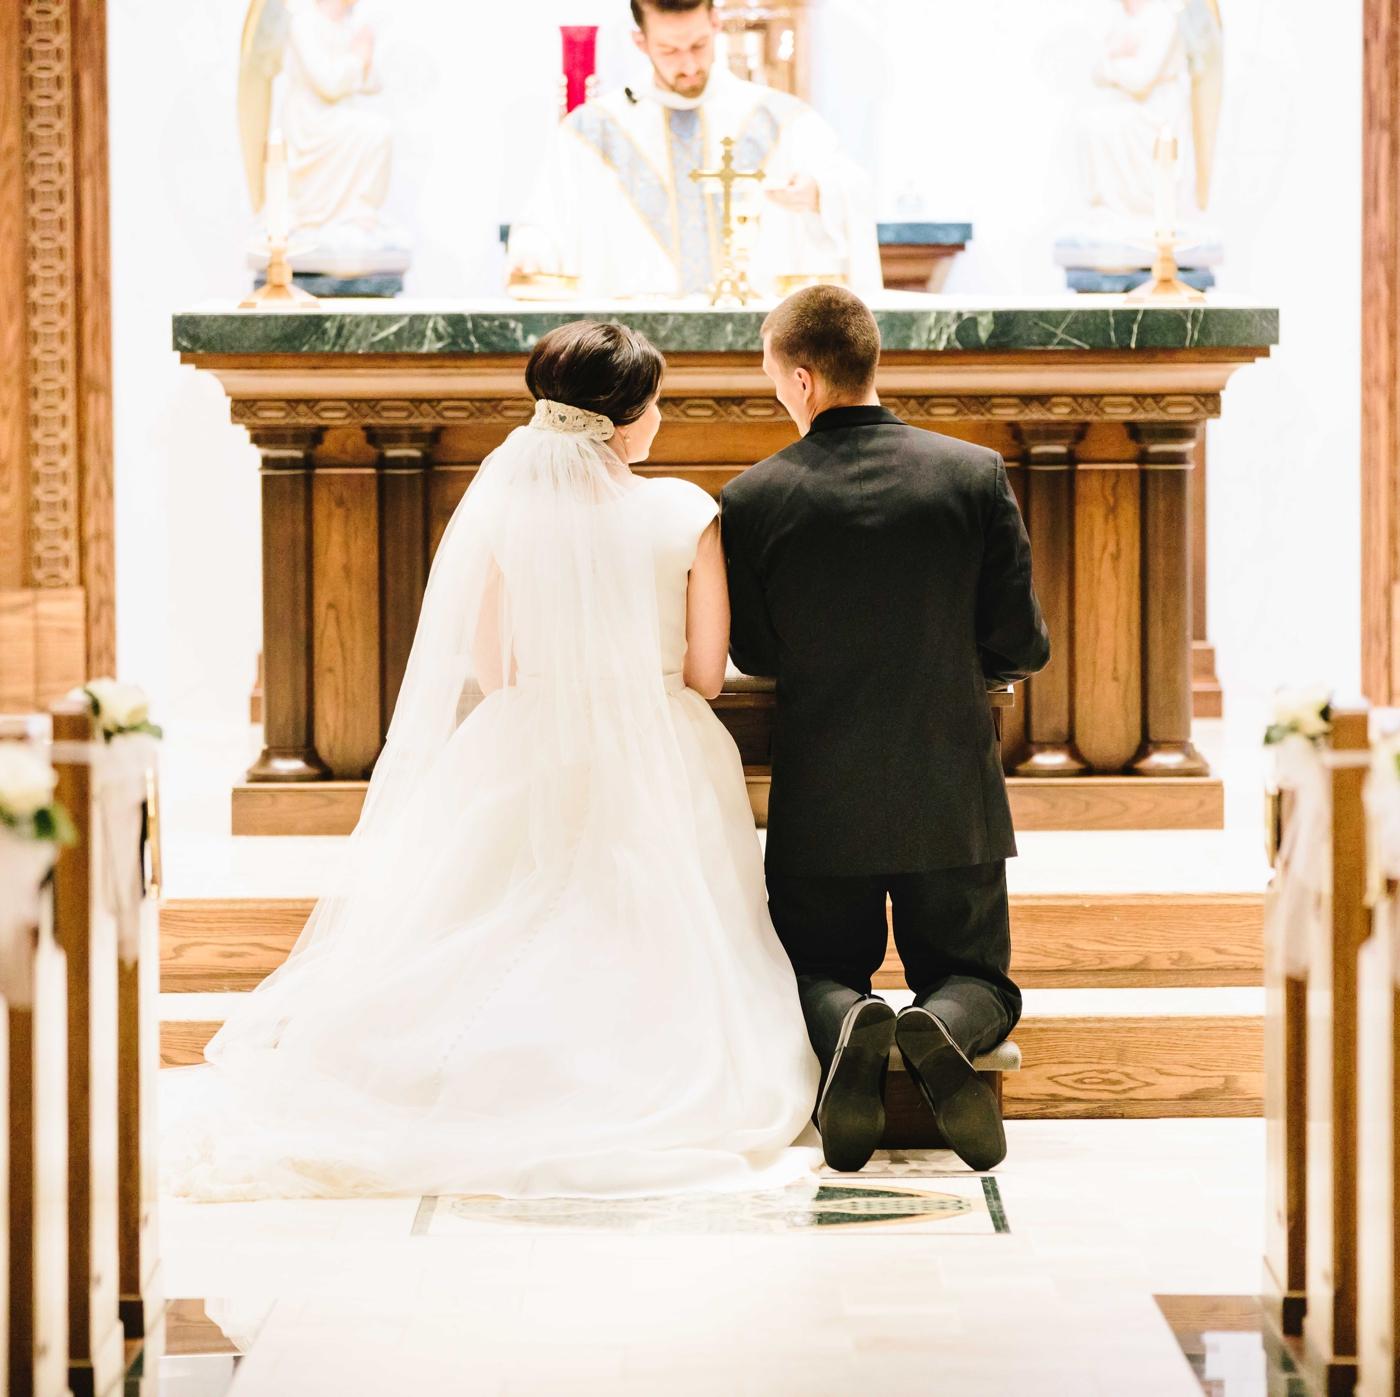 chicago-fine-art-wedding-photography-mccarthy46